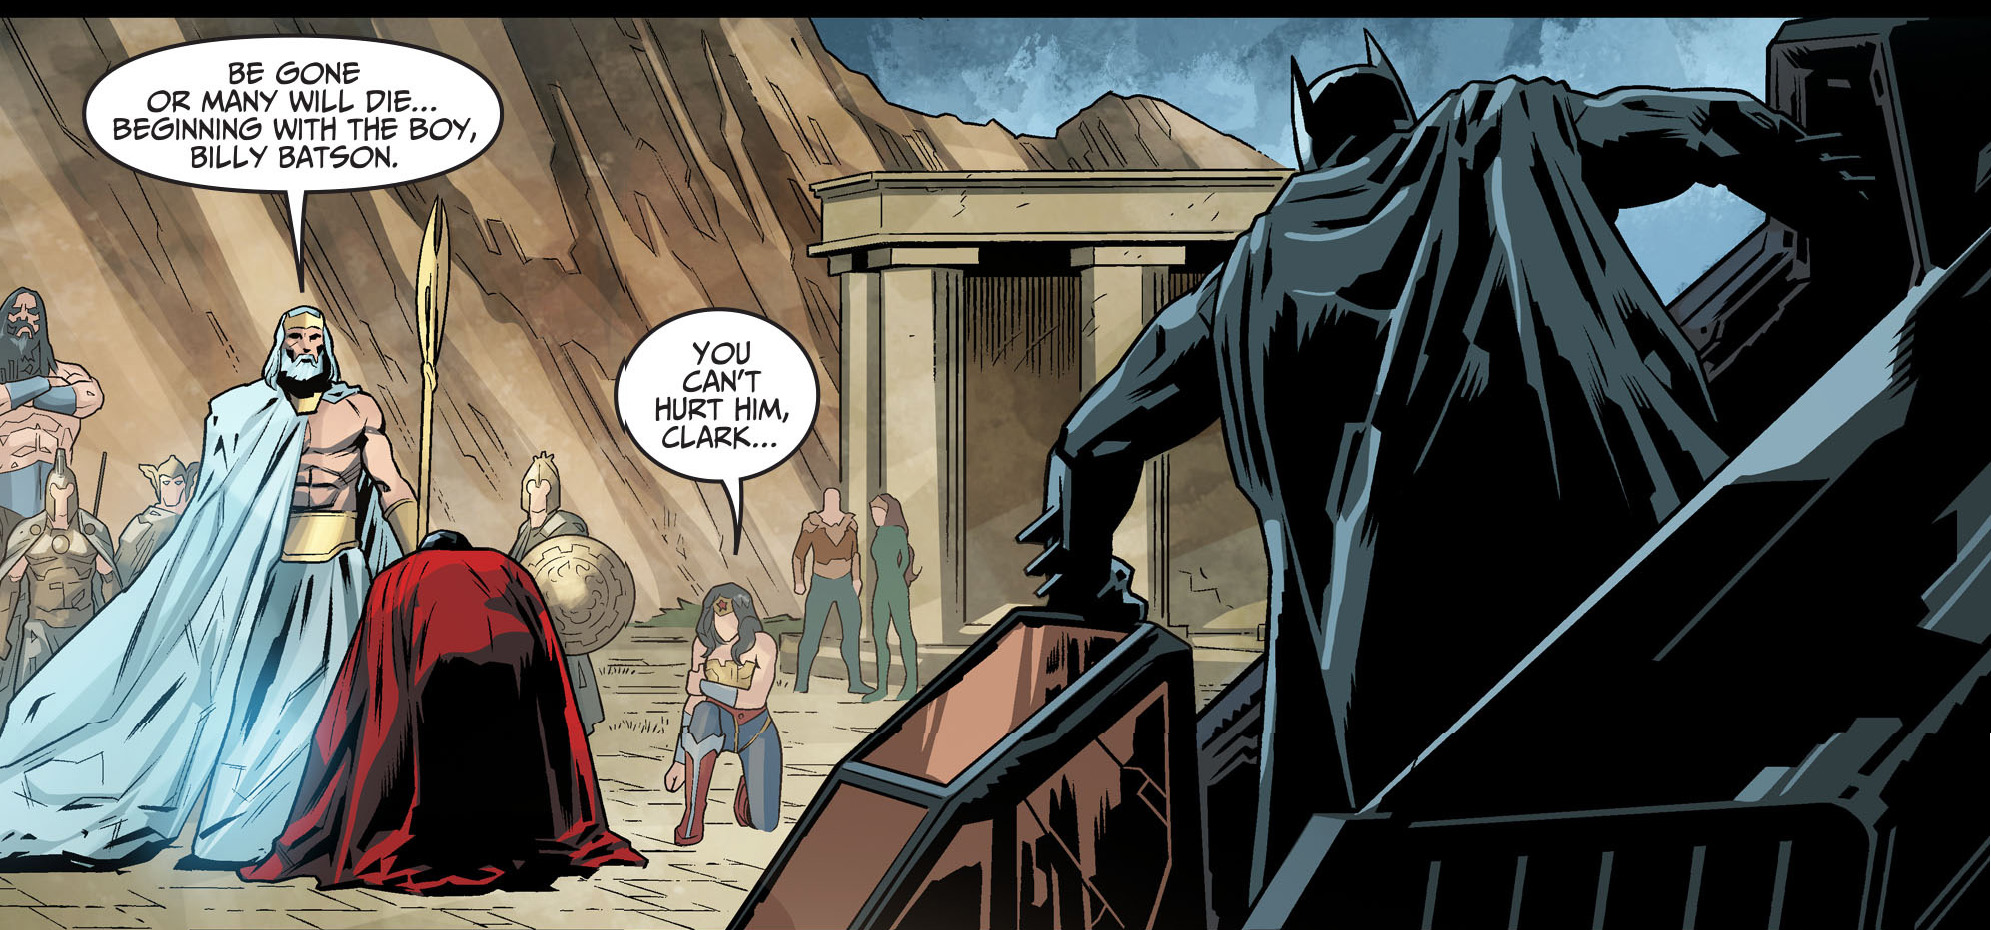 Superman Vs Zeus Injustice Gods Among Us  Comicnewbies-7294